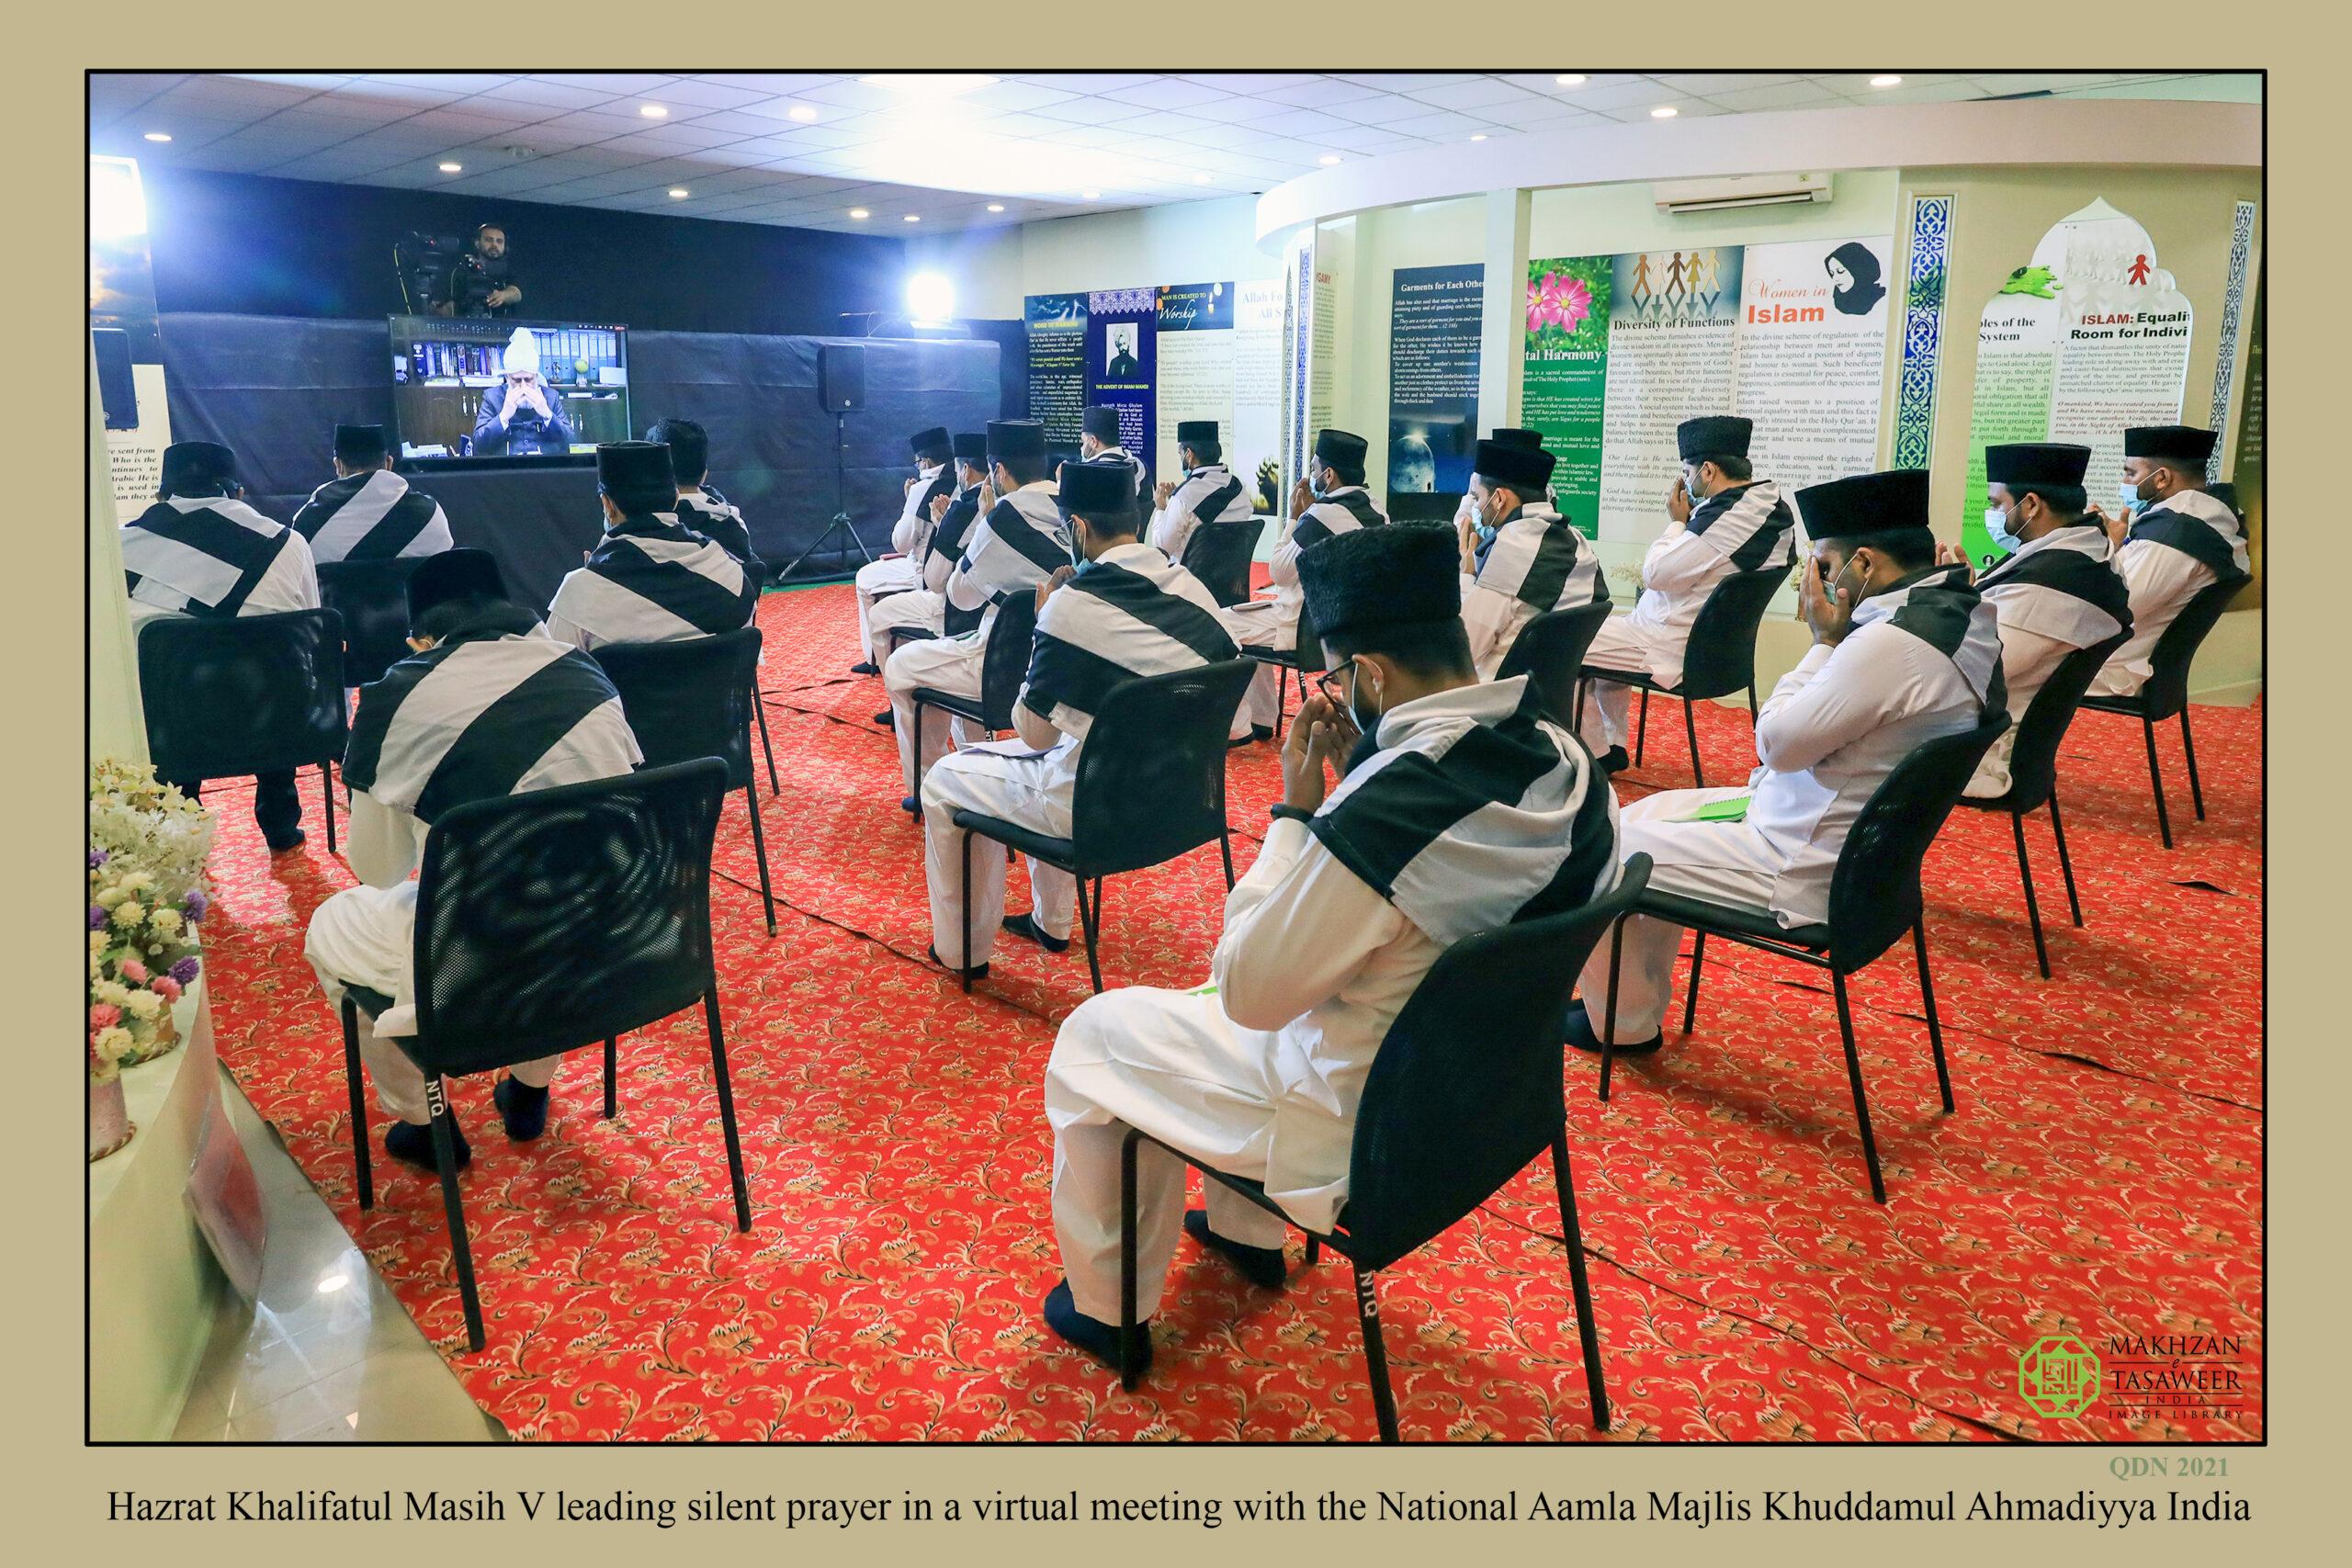 Hazrat Khalifatul Masih V grants a virtual meeting to the national Aamla Majlis Khuddamul Ahmadiyya India 005